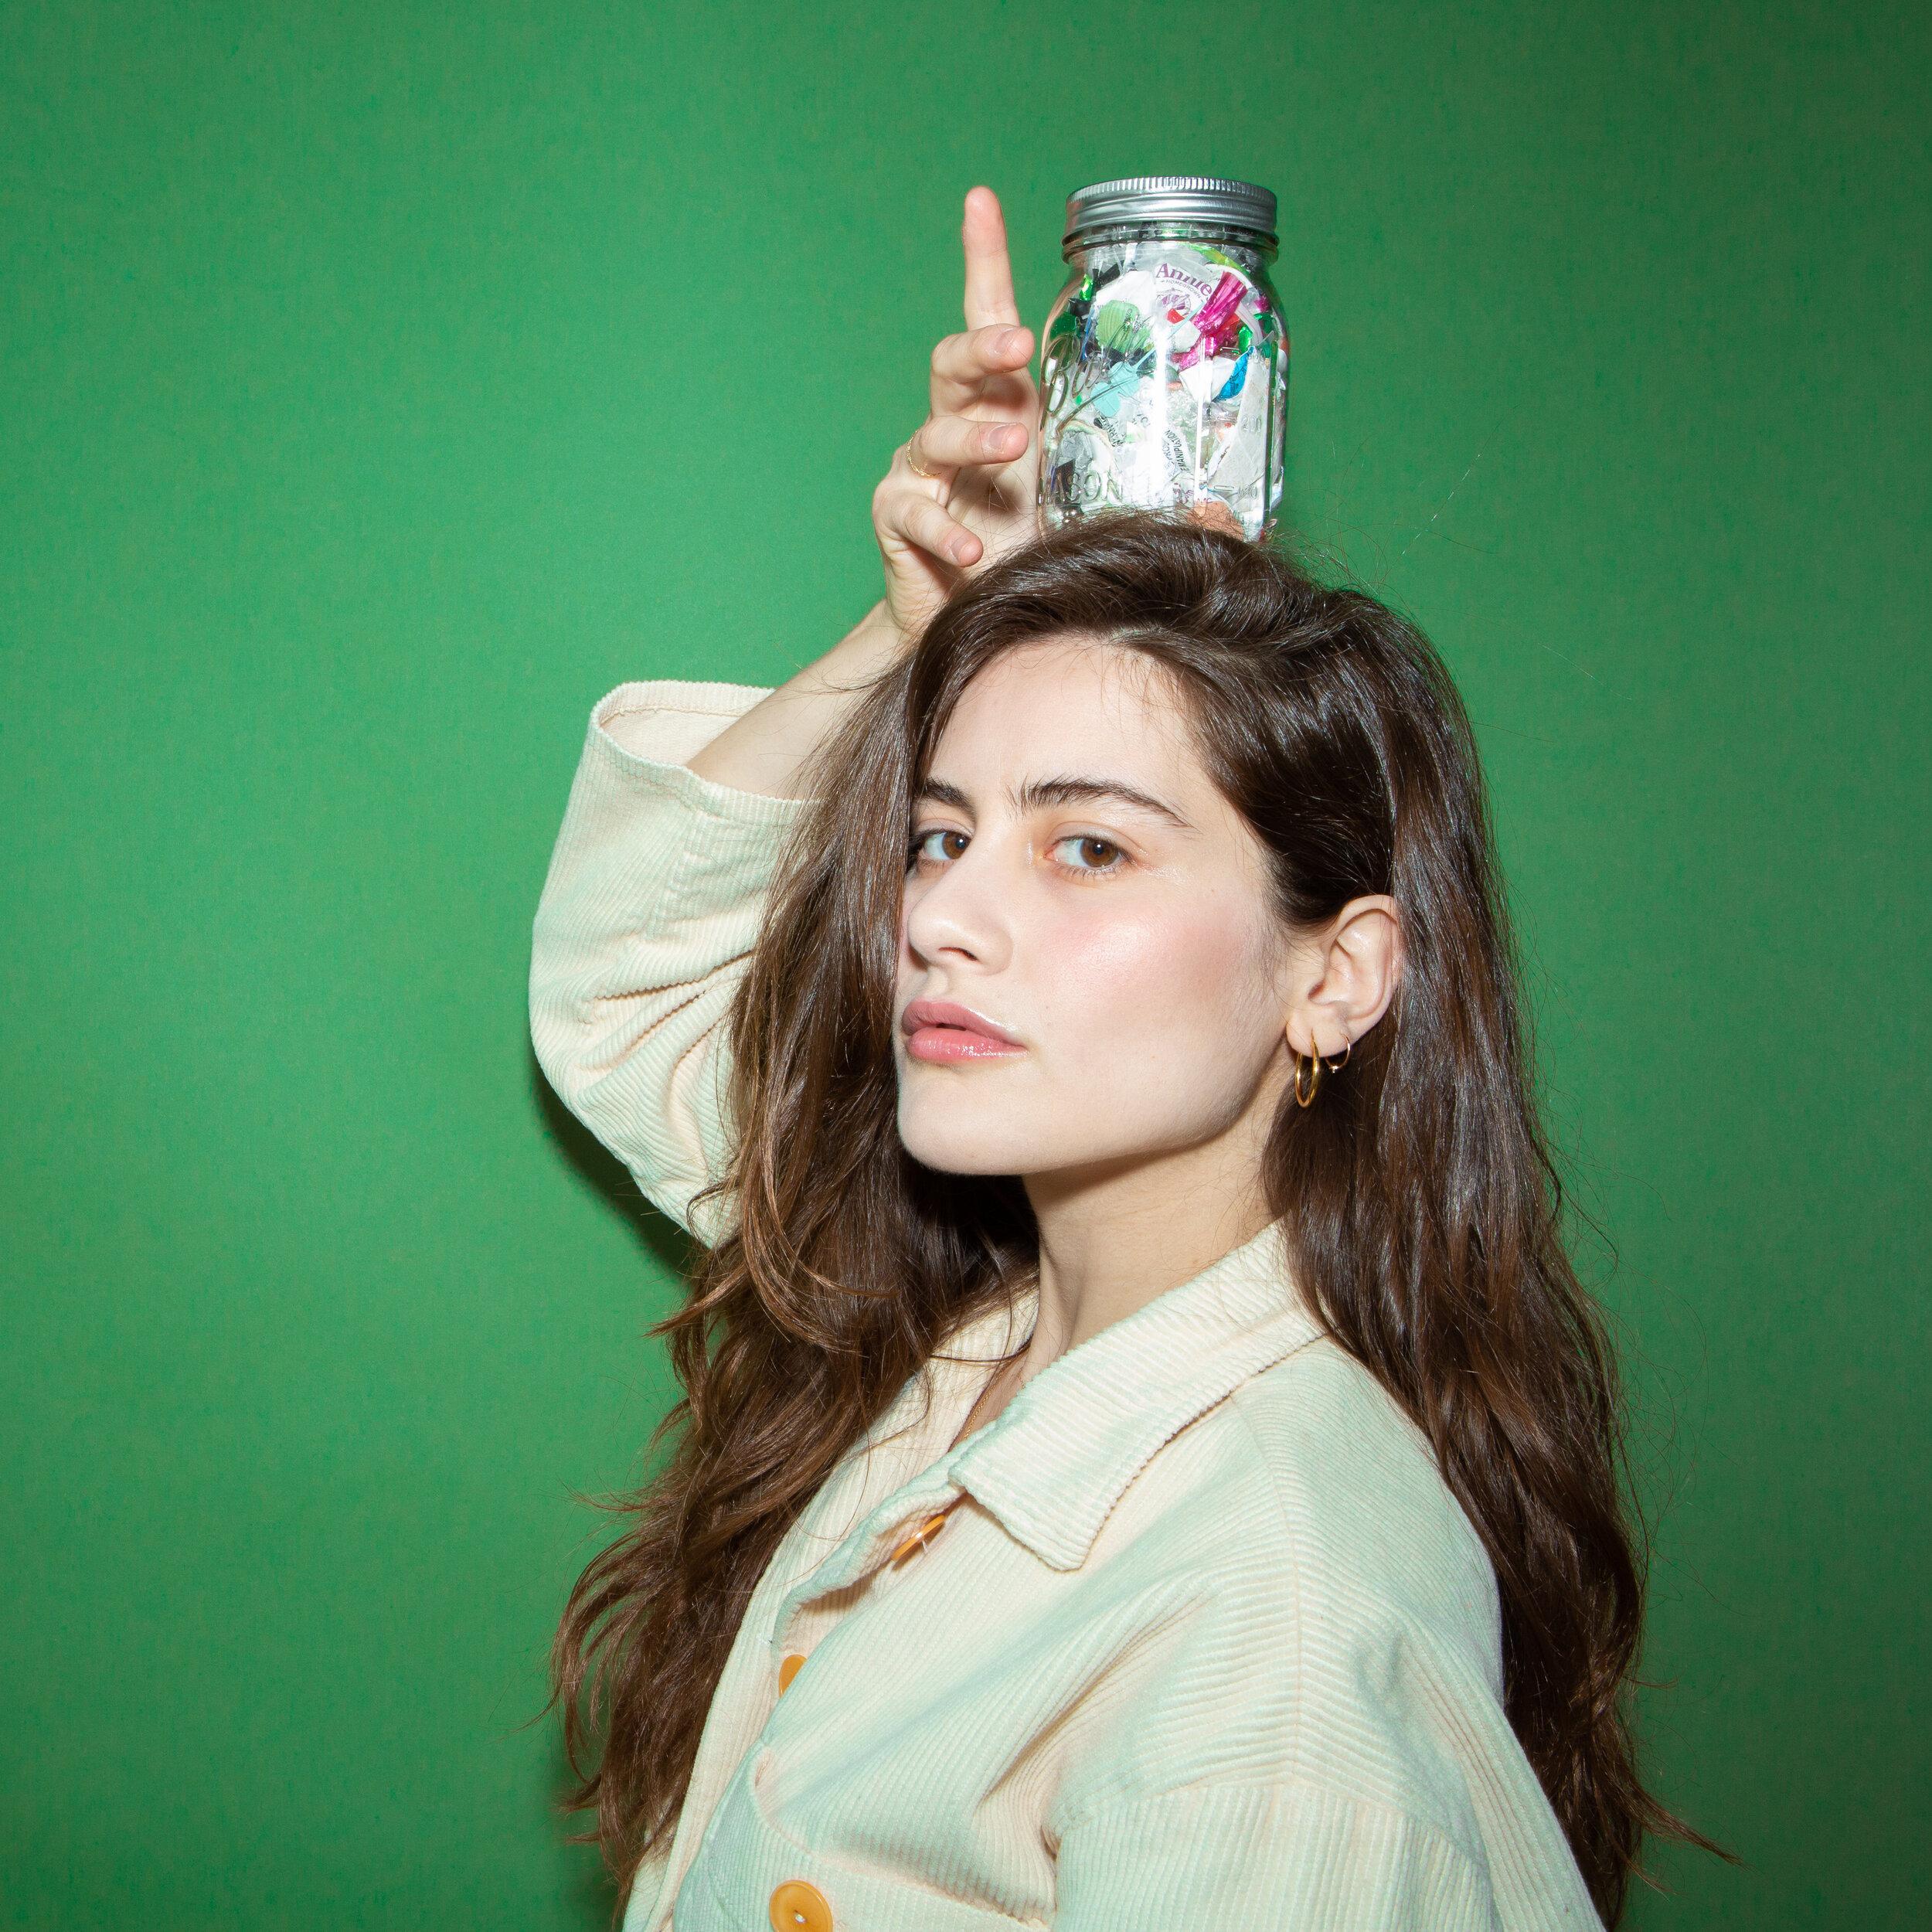 Lauren Singer - Founder, Trash Is for Tossers